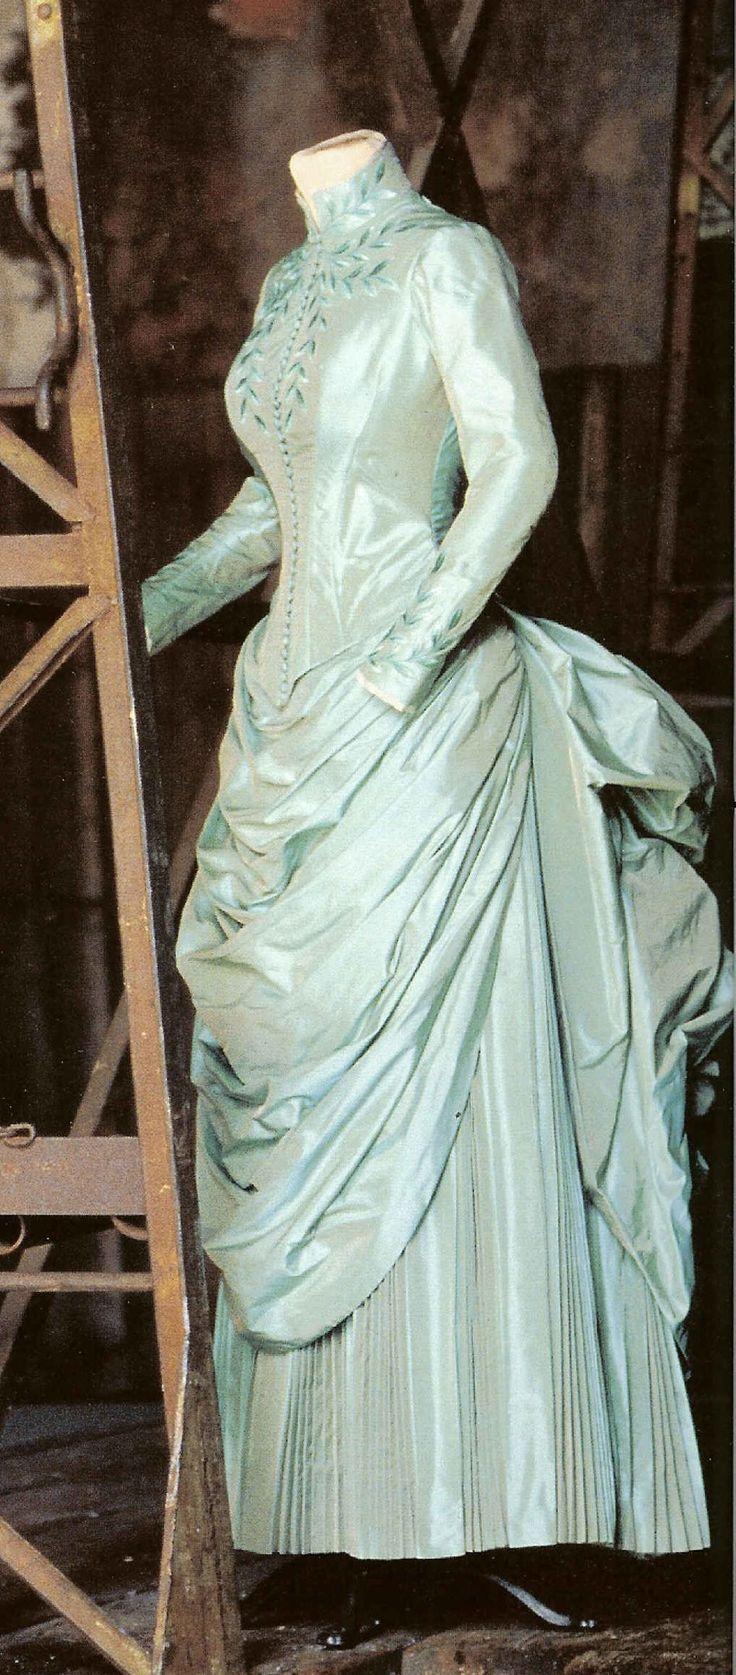 Mina Harker's Blue Day Dress: